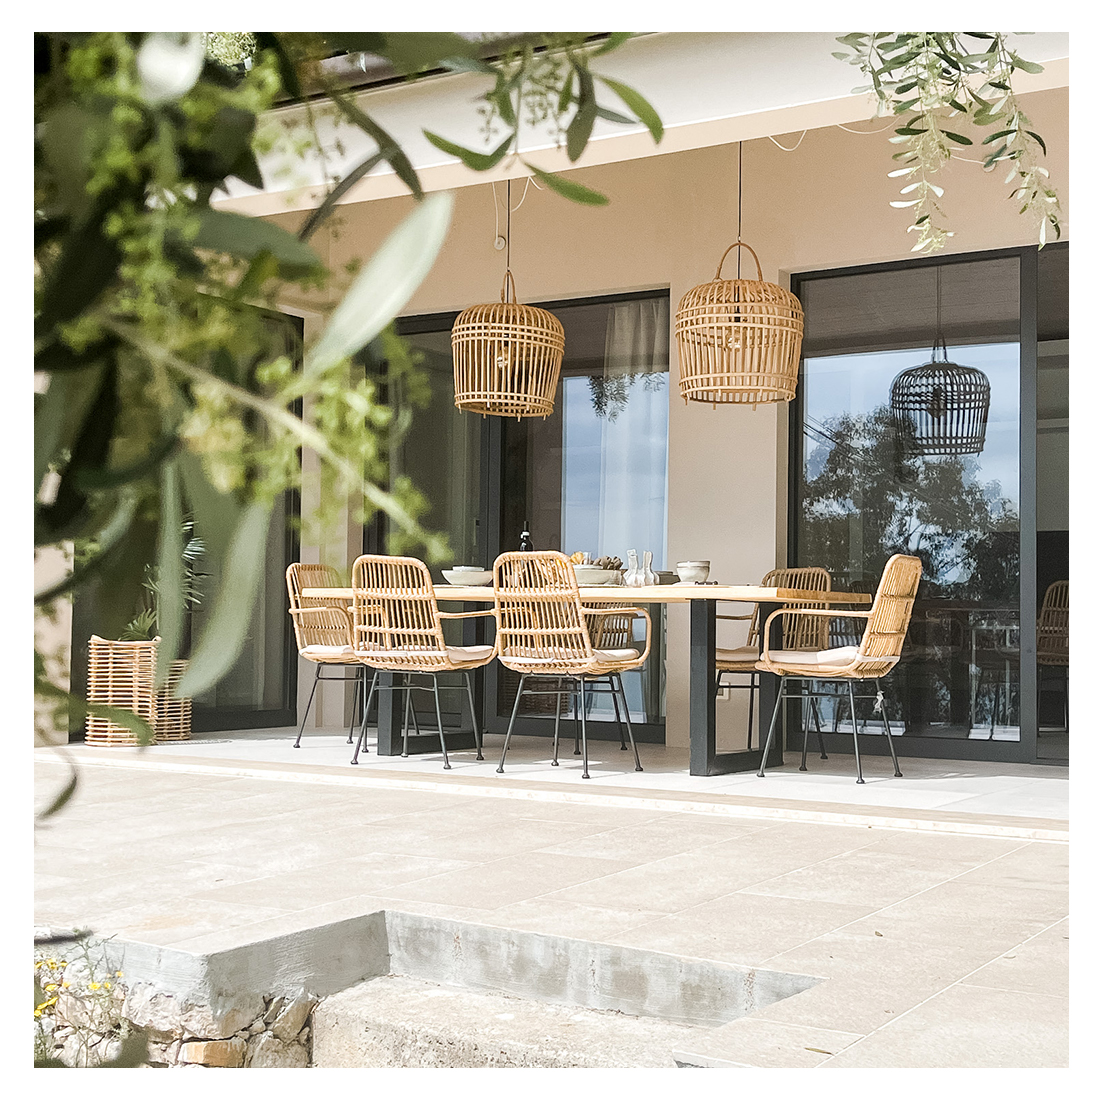 Balzi rossi holiday resort italy 013